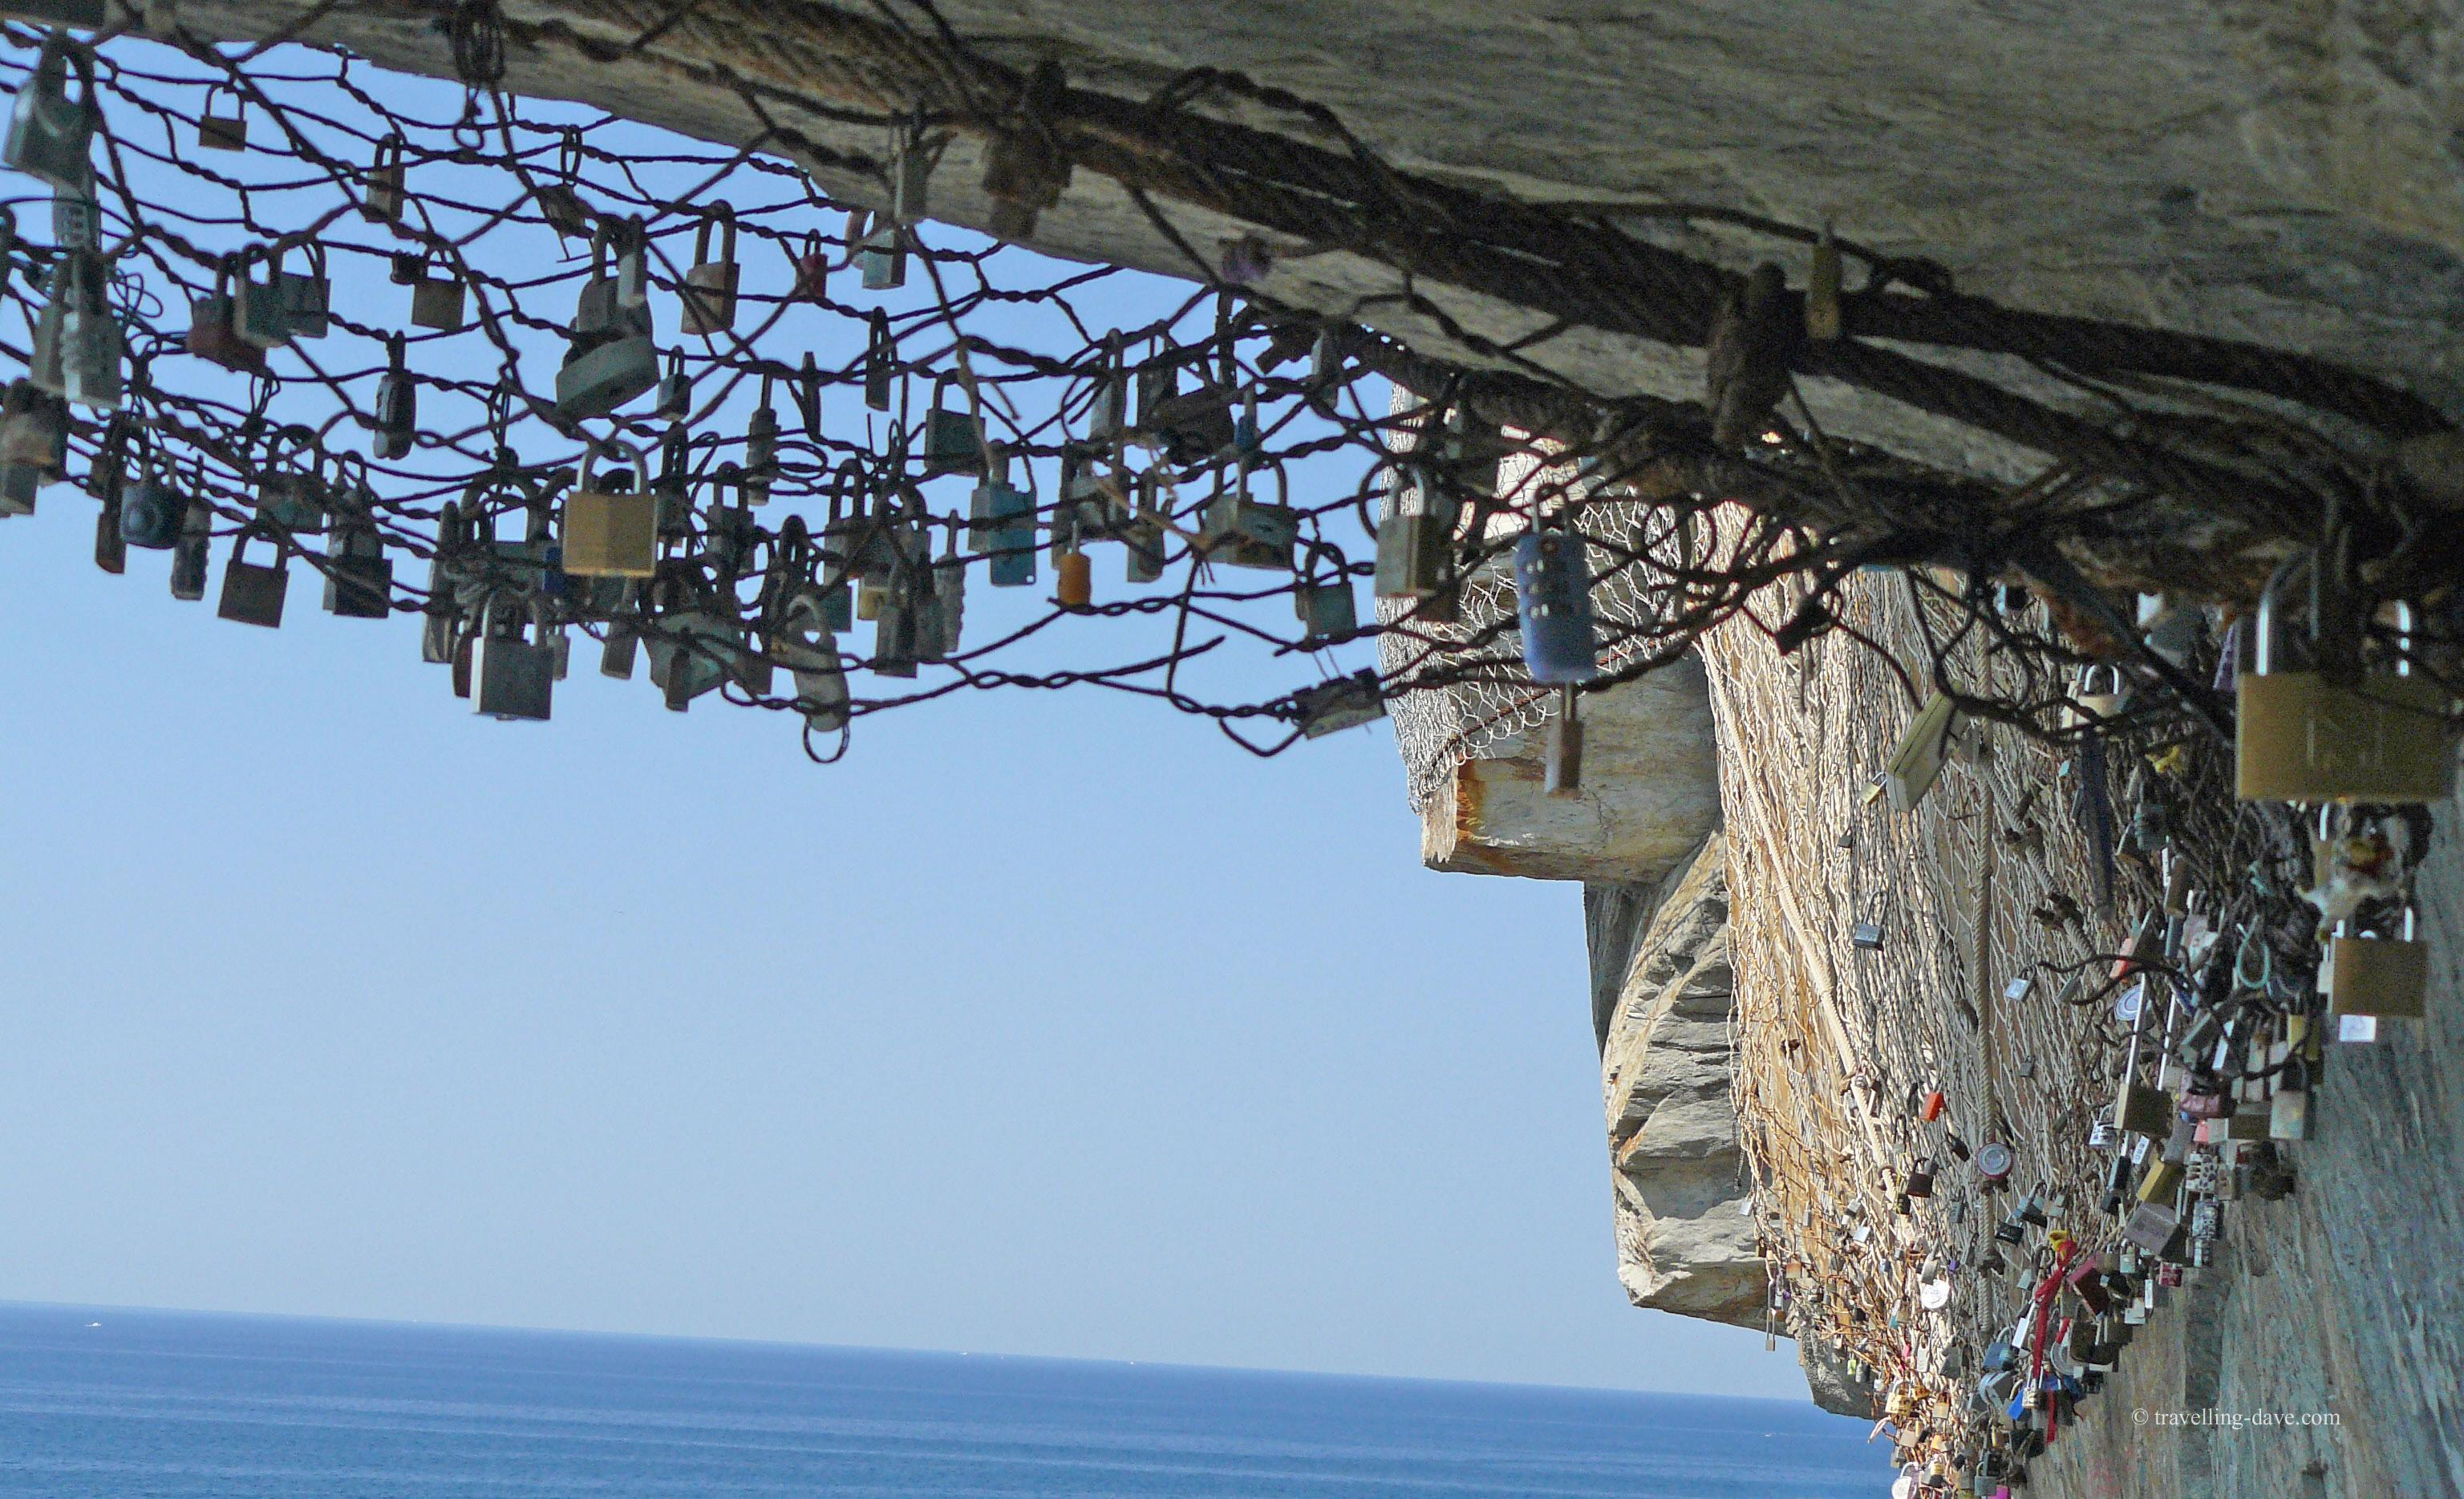 Love locks along the Lovers' Walk in Italy